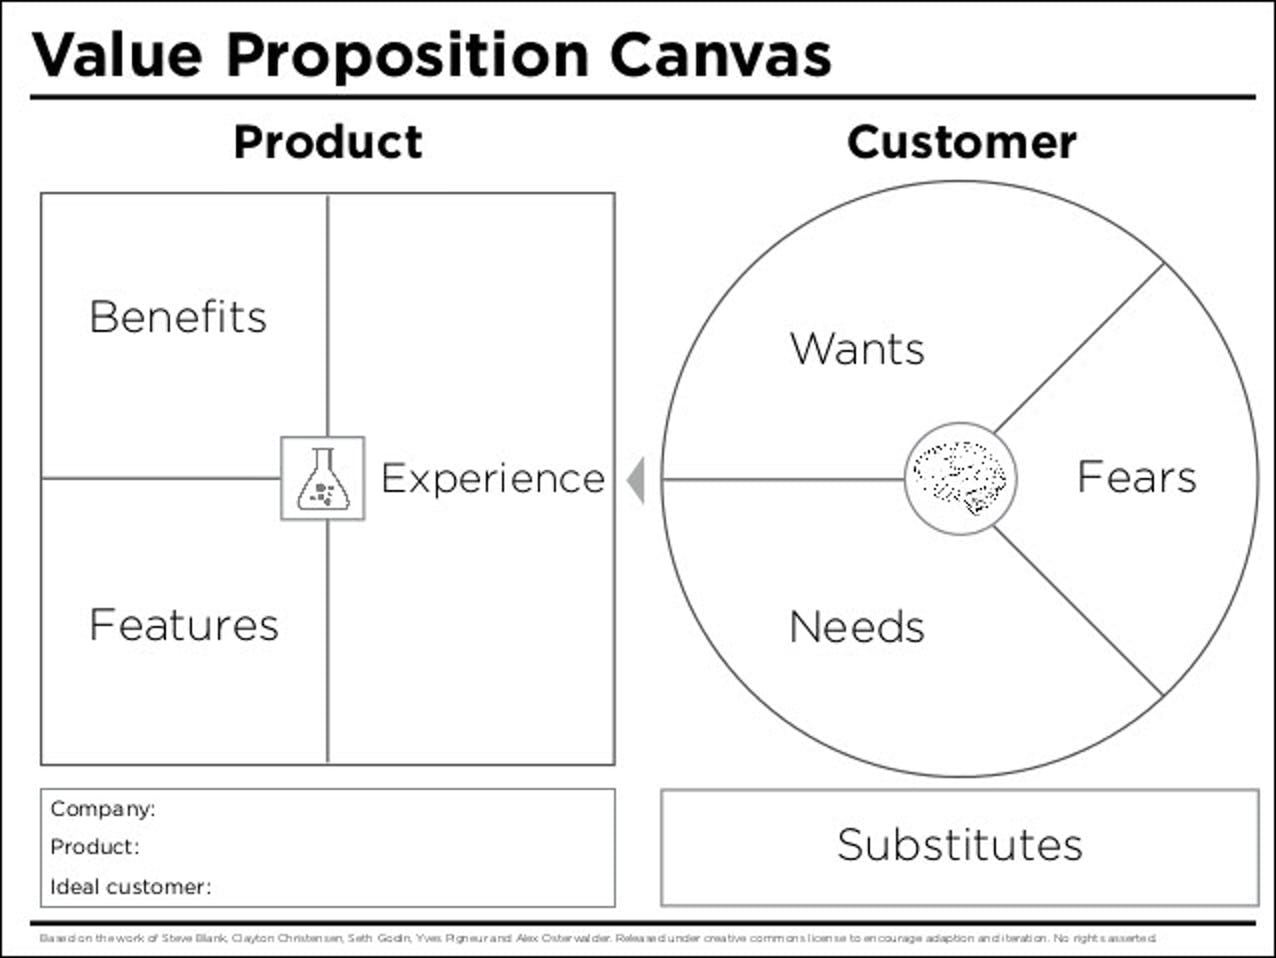 peter thomson's value proposition canvas